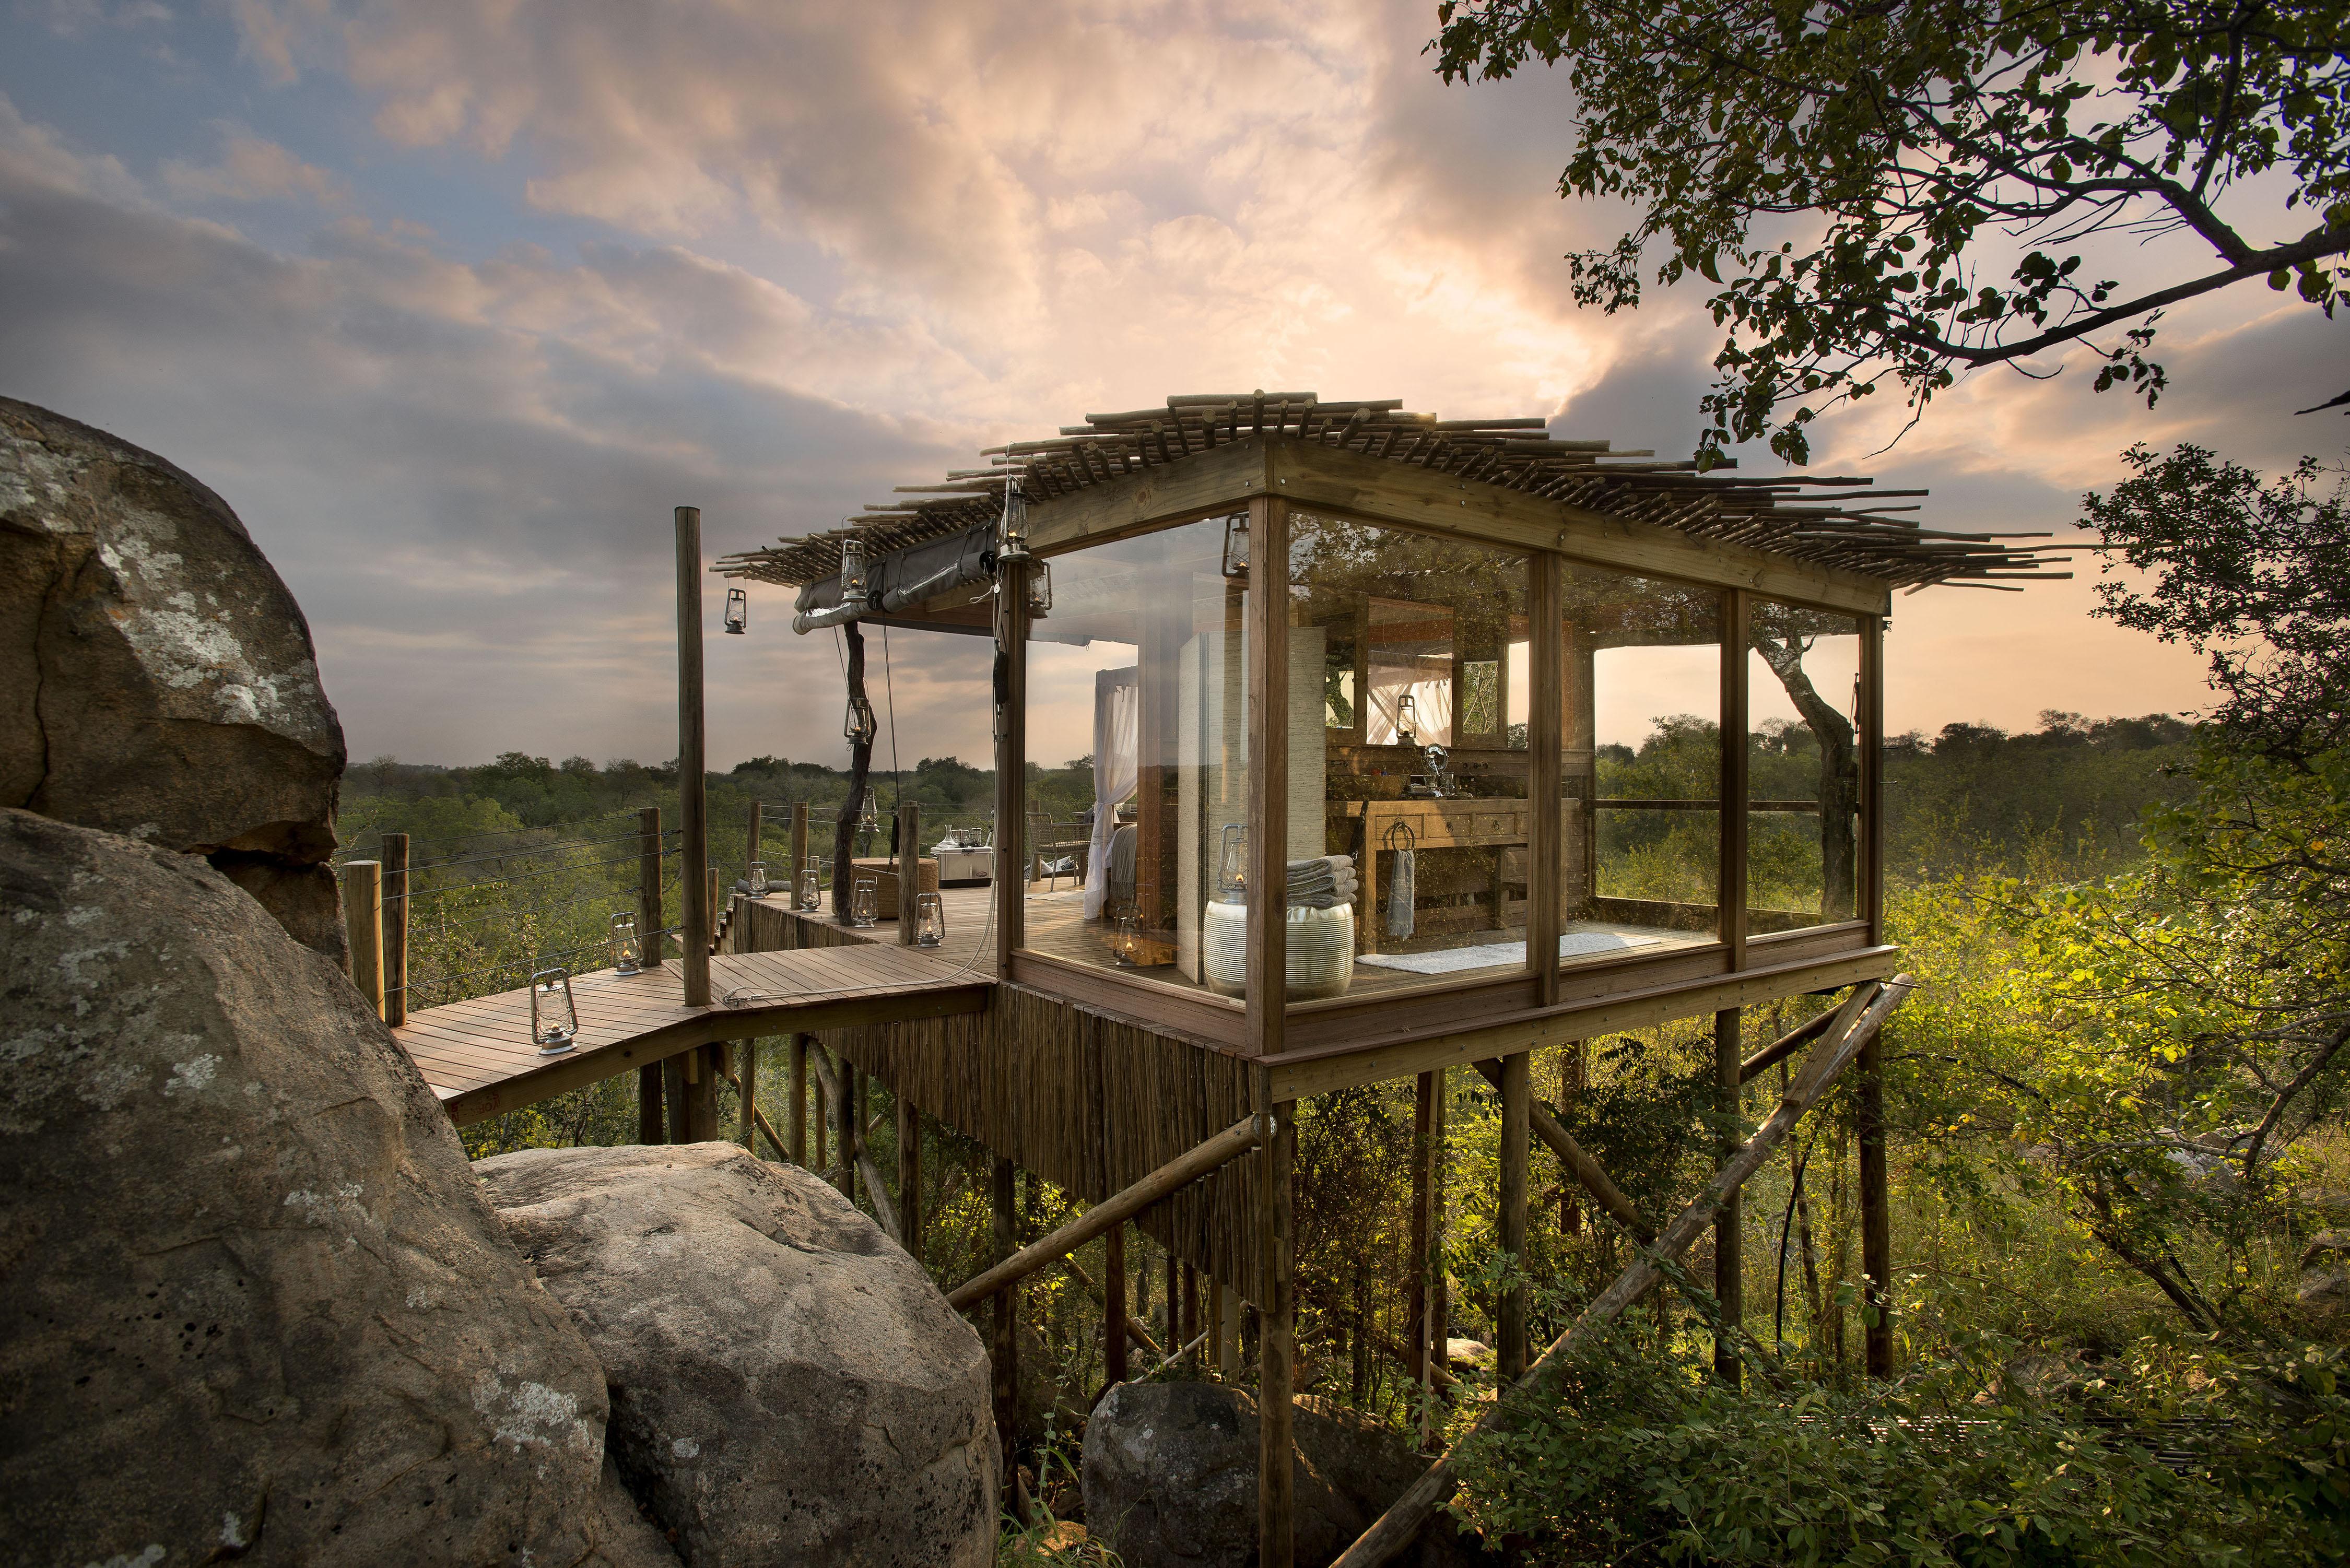 Lion sands treehouse hotel